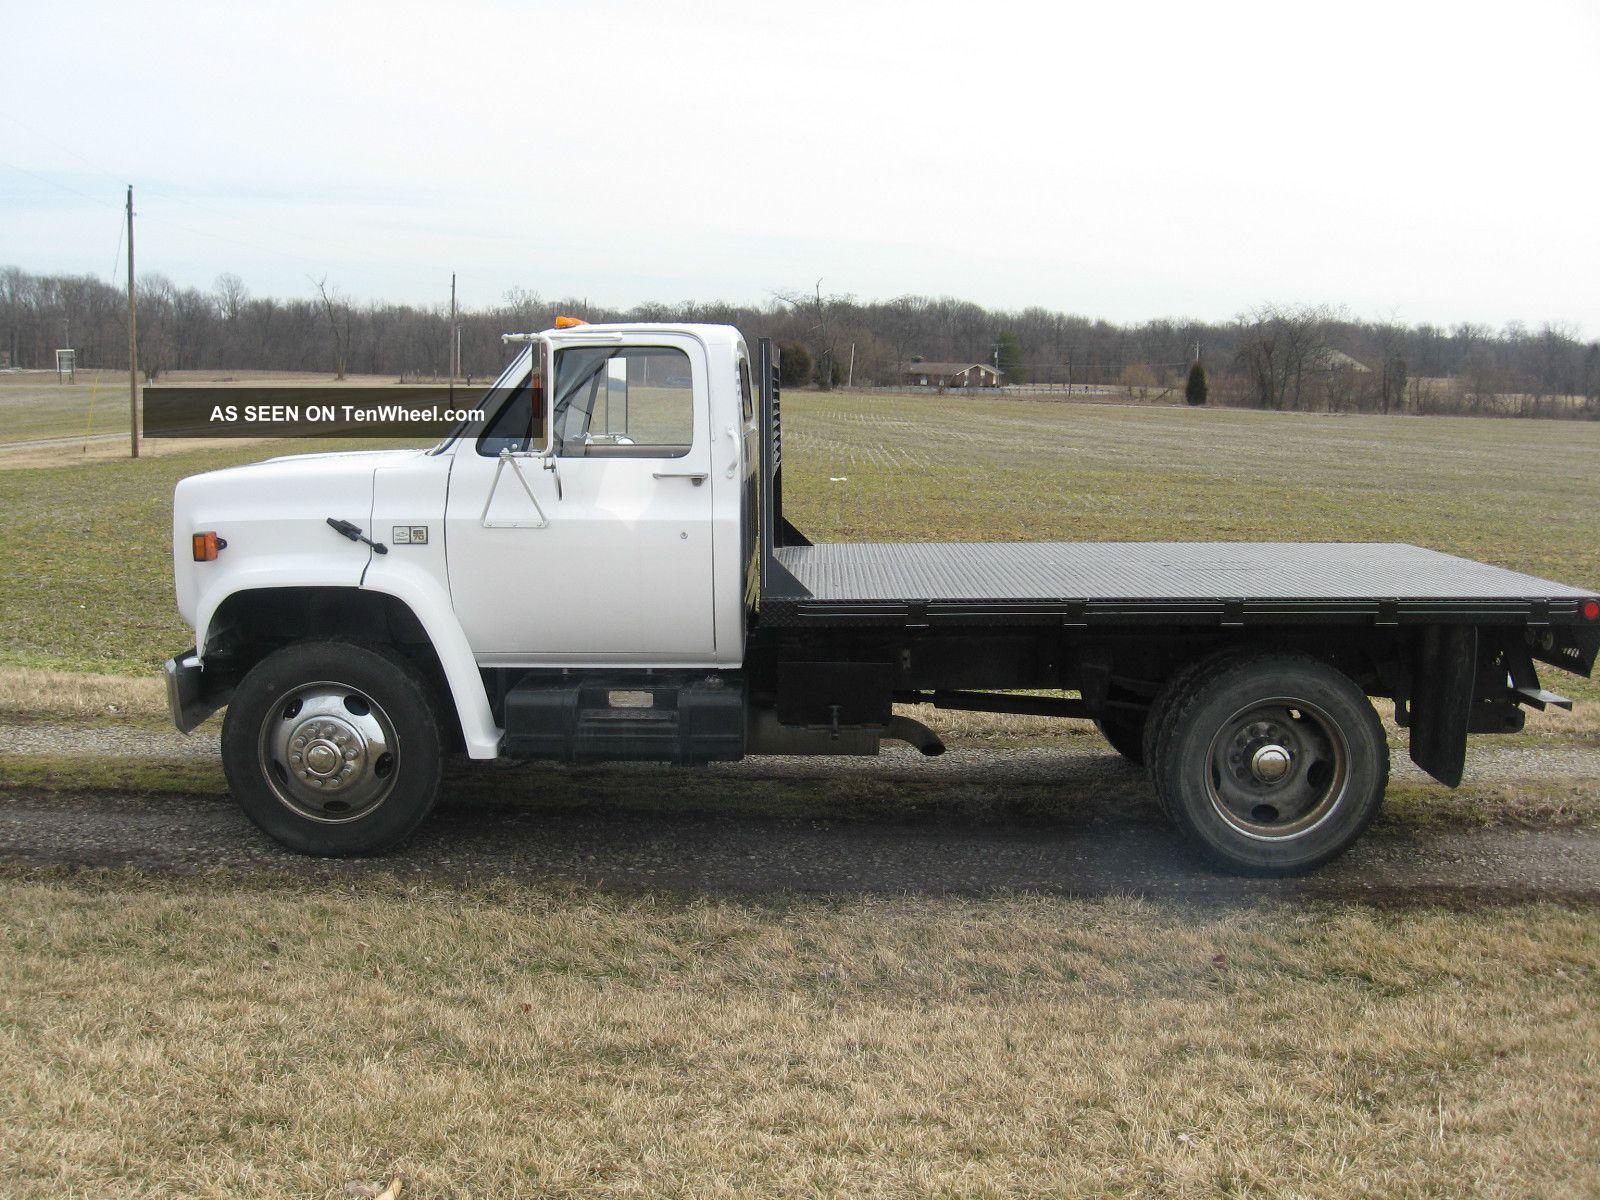 1988 Chevrolet C70 Flatbed Truck 8 2 Liter Turbo Diesel W